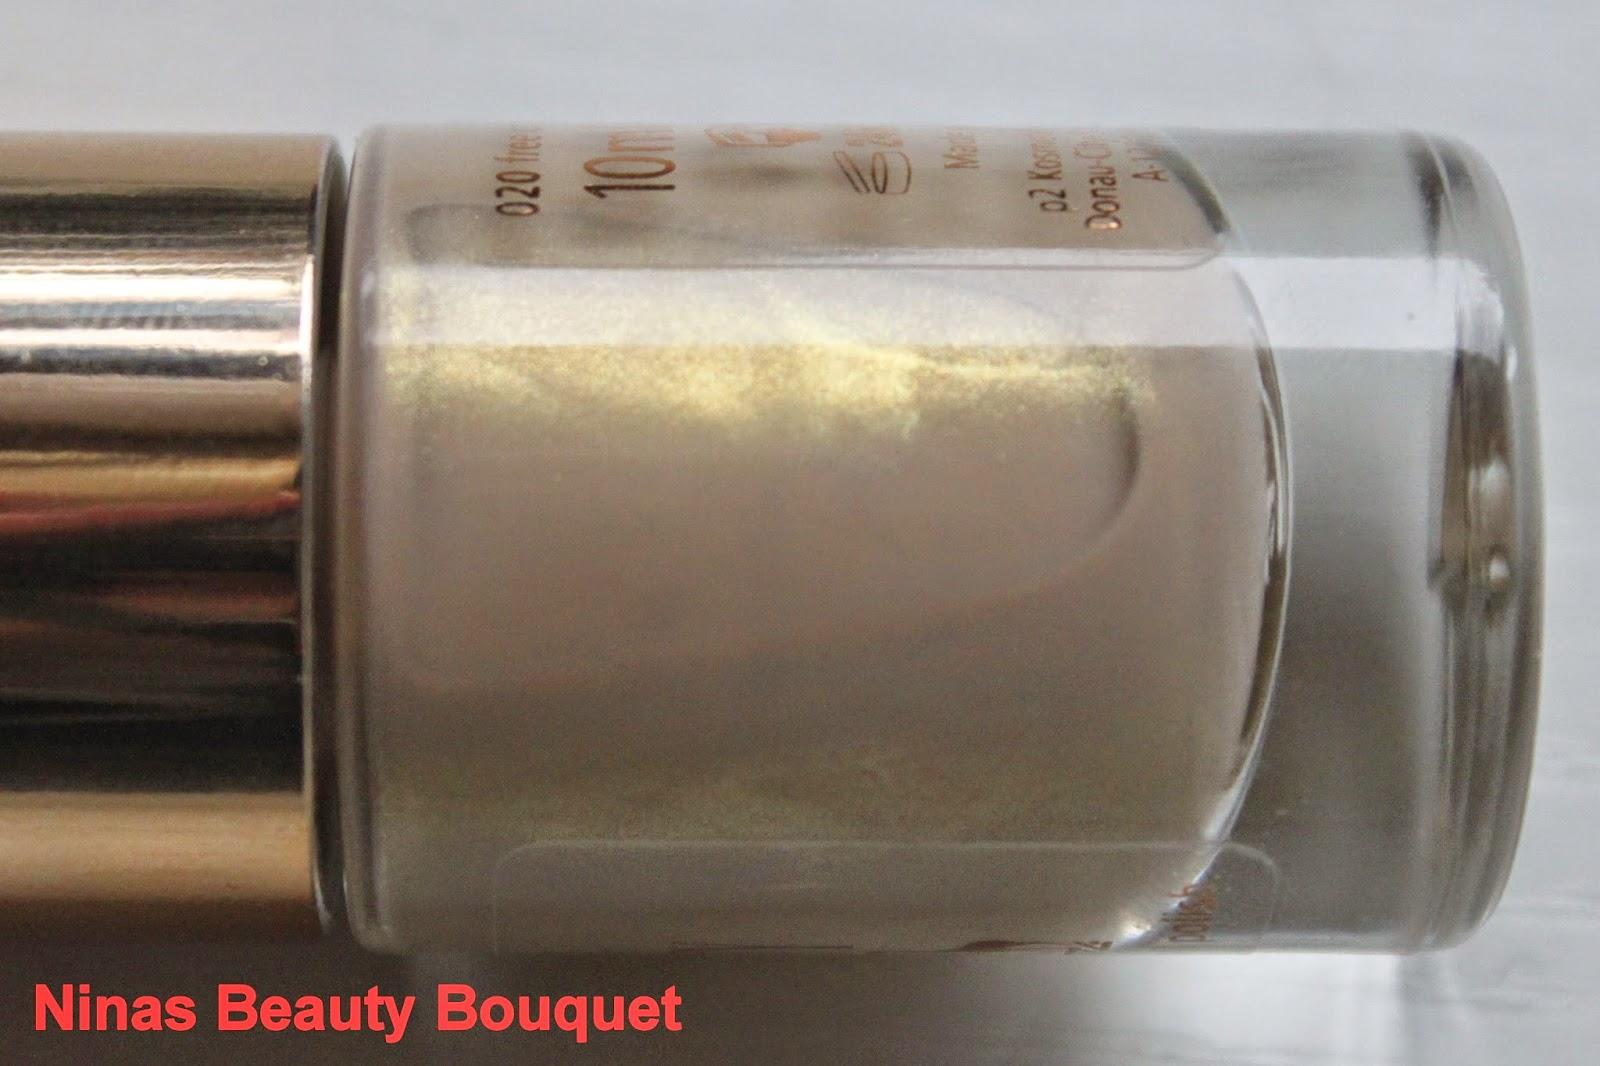 P2 LE Beauty goes Safari Nagellack 020 free of bonds  [Review]